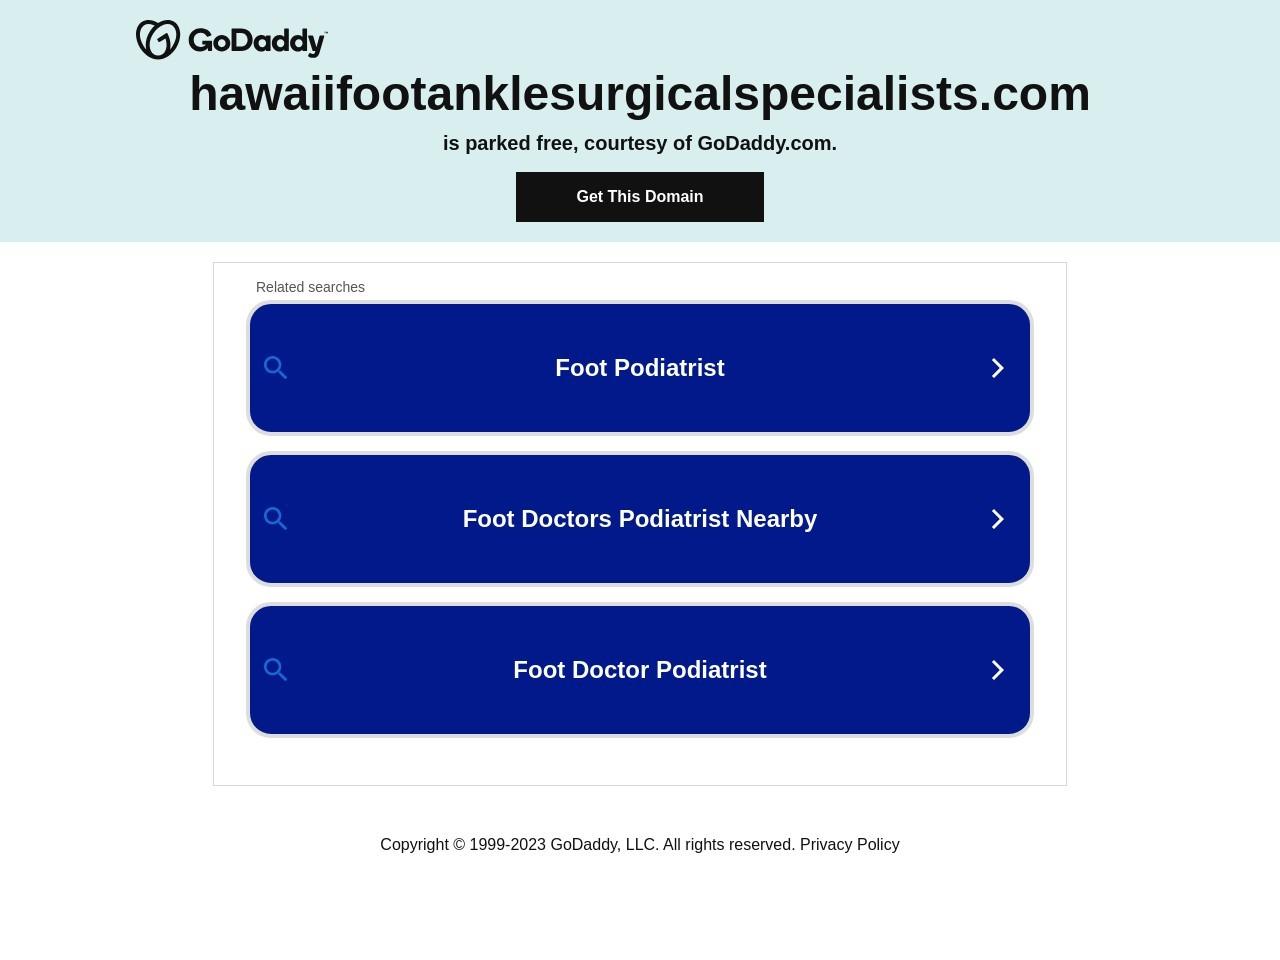 www.hawaiifootanklesurgicalspecialists.com screenshot